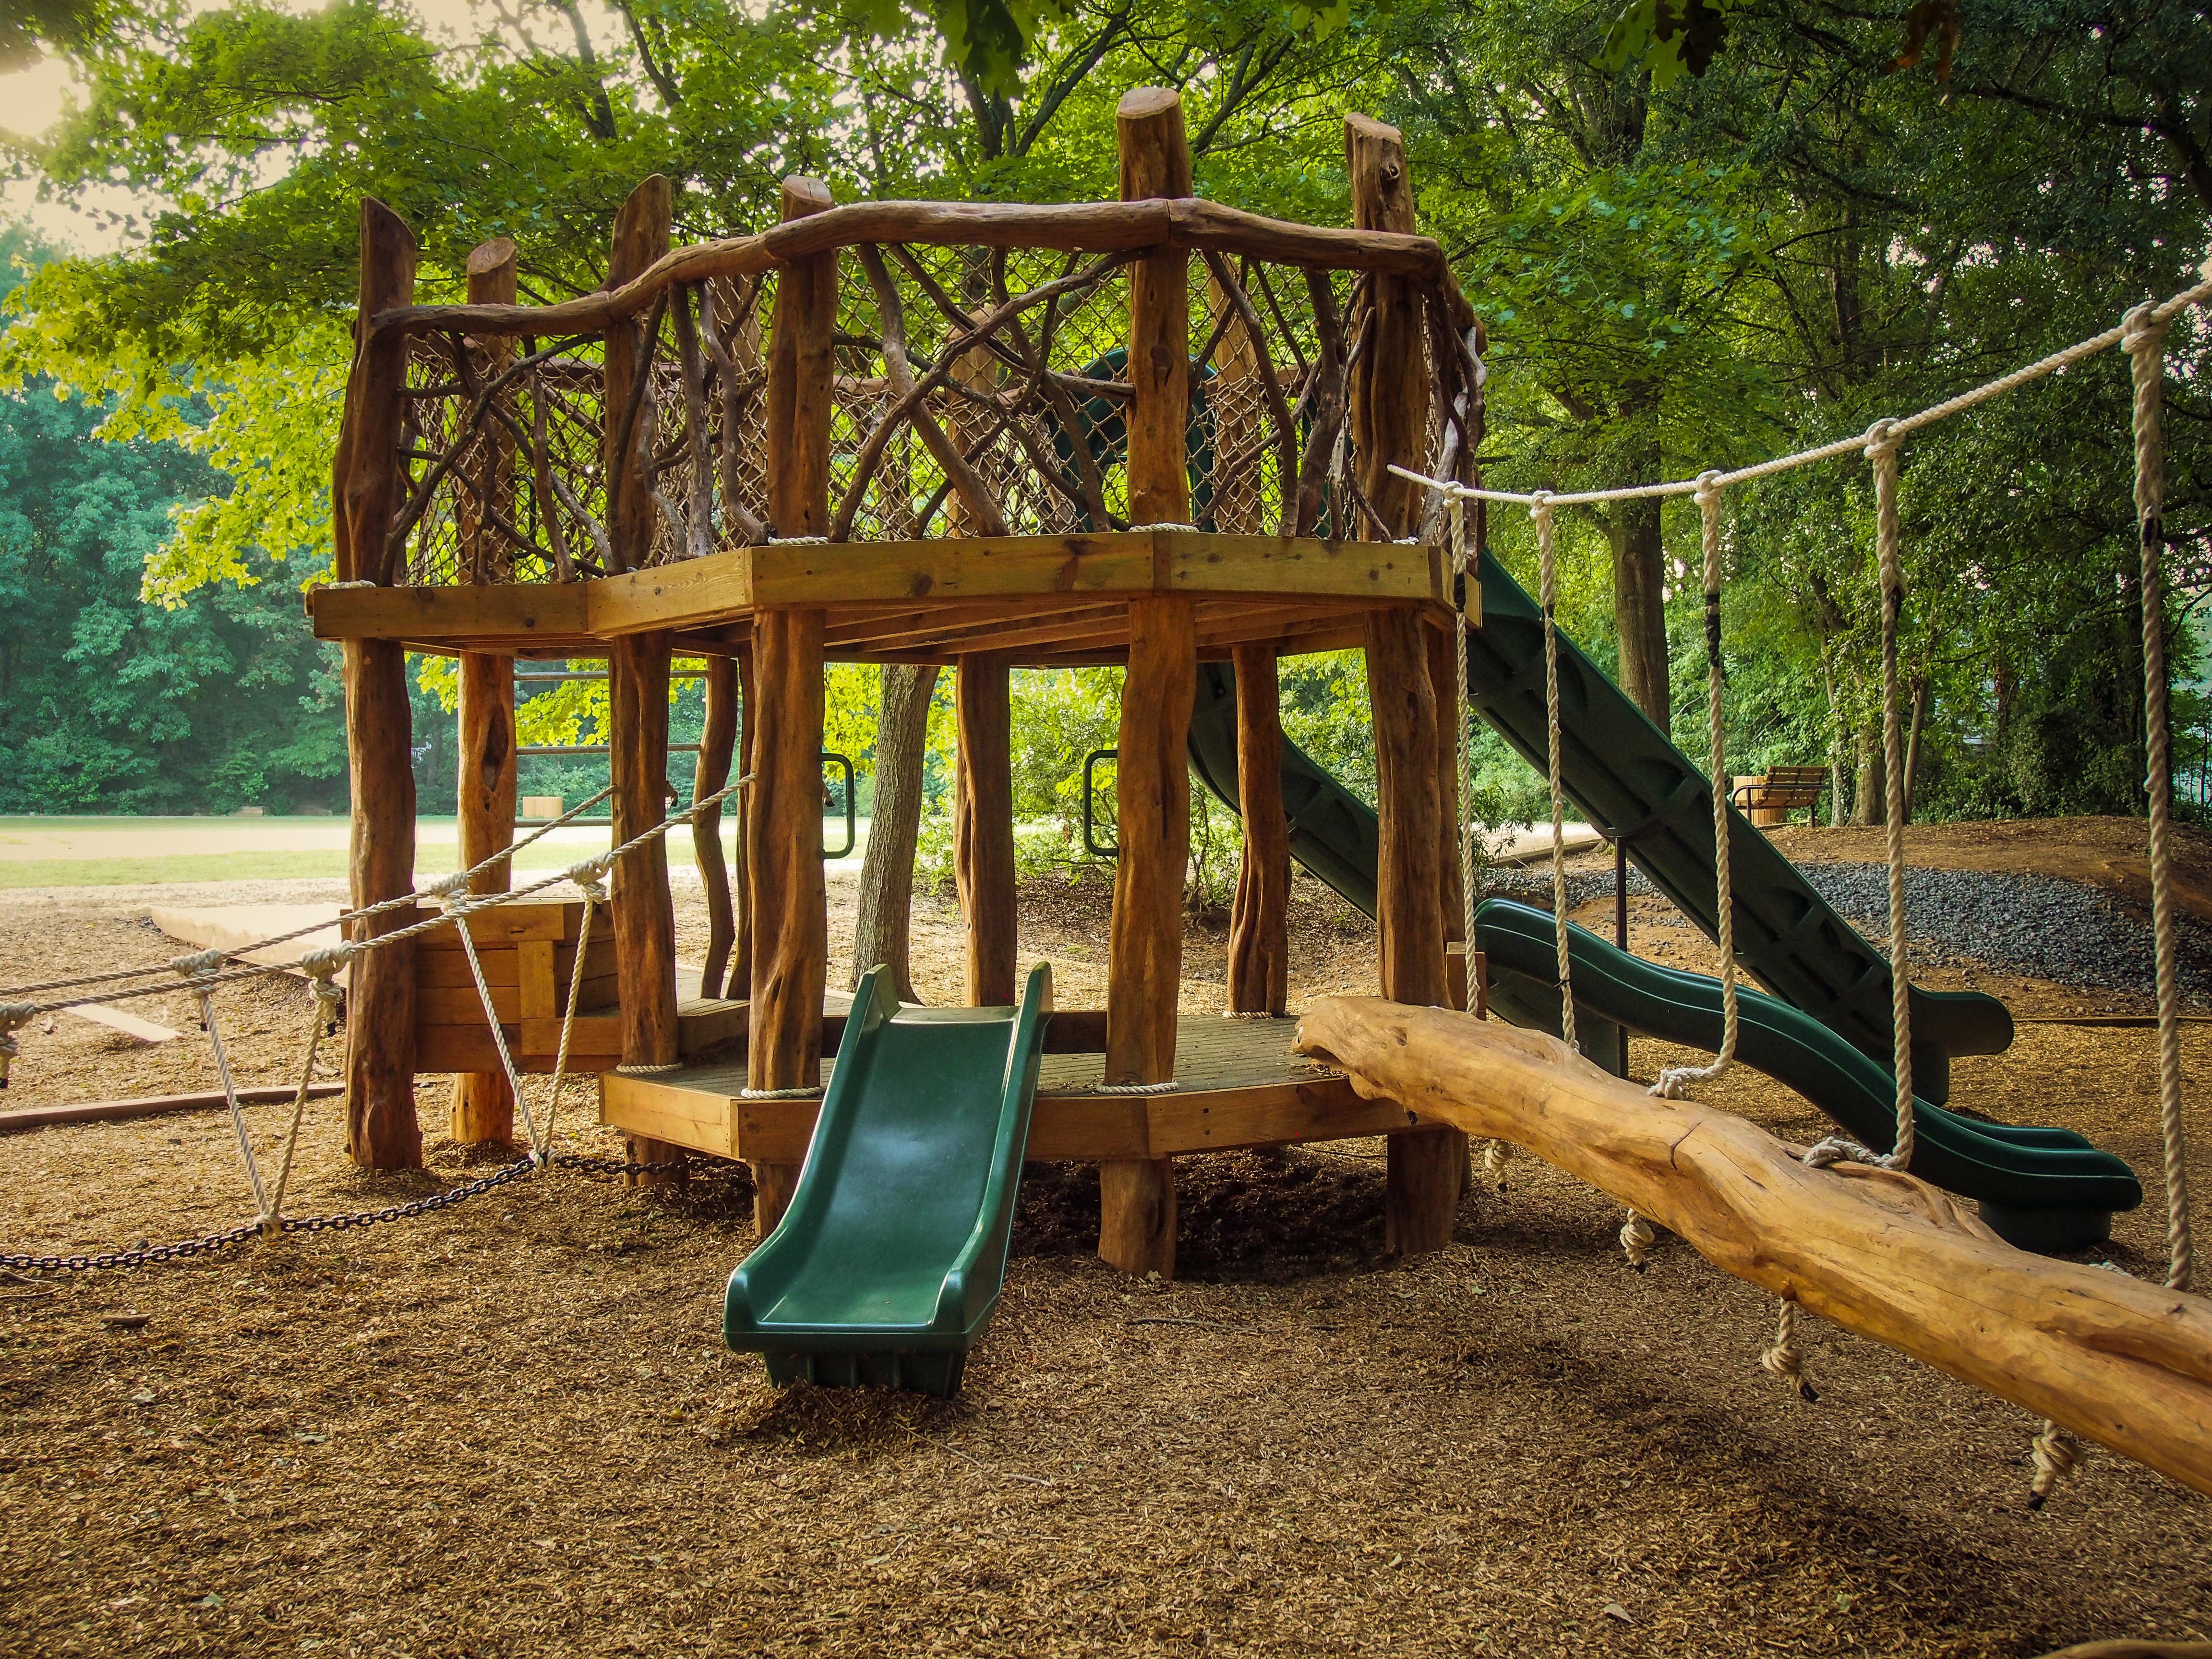 low ropes playground